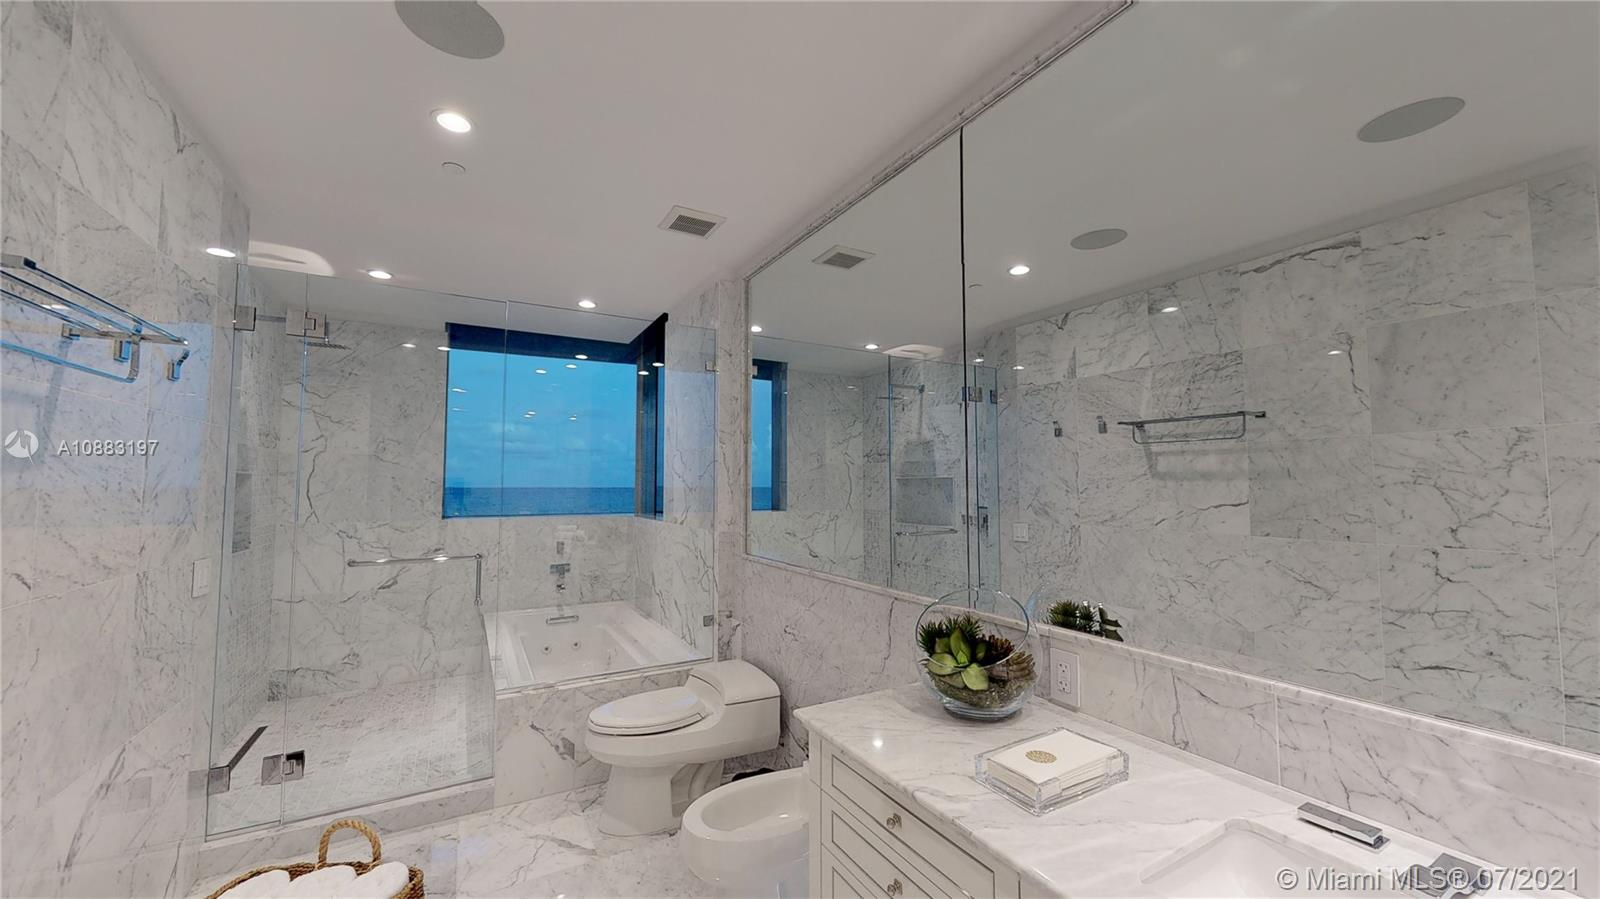 FENDI Chateau Residences, 9349 Collins Ave Unit 506, Surfside, Florida 33154, image 34